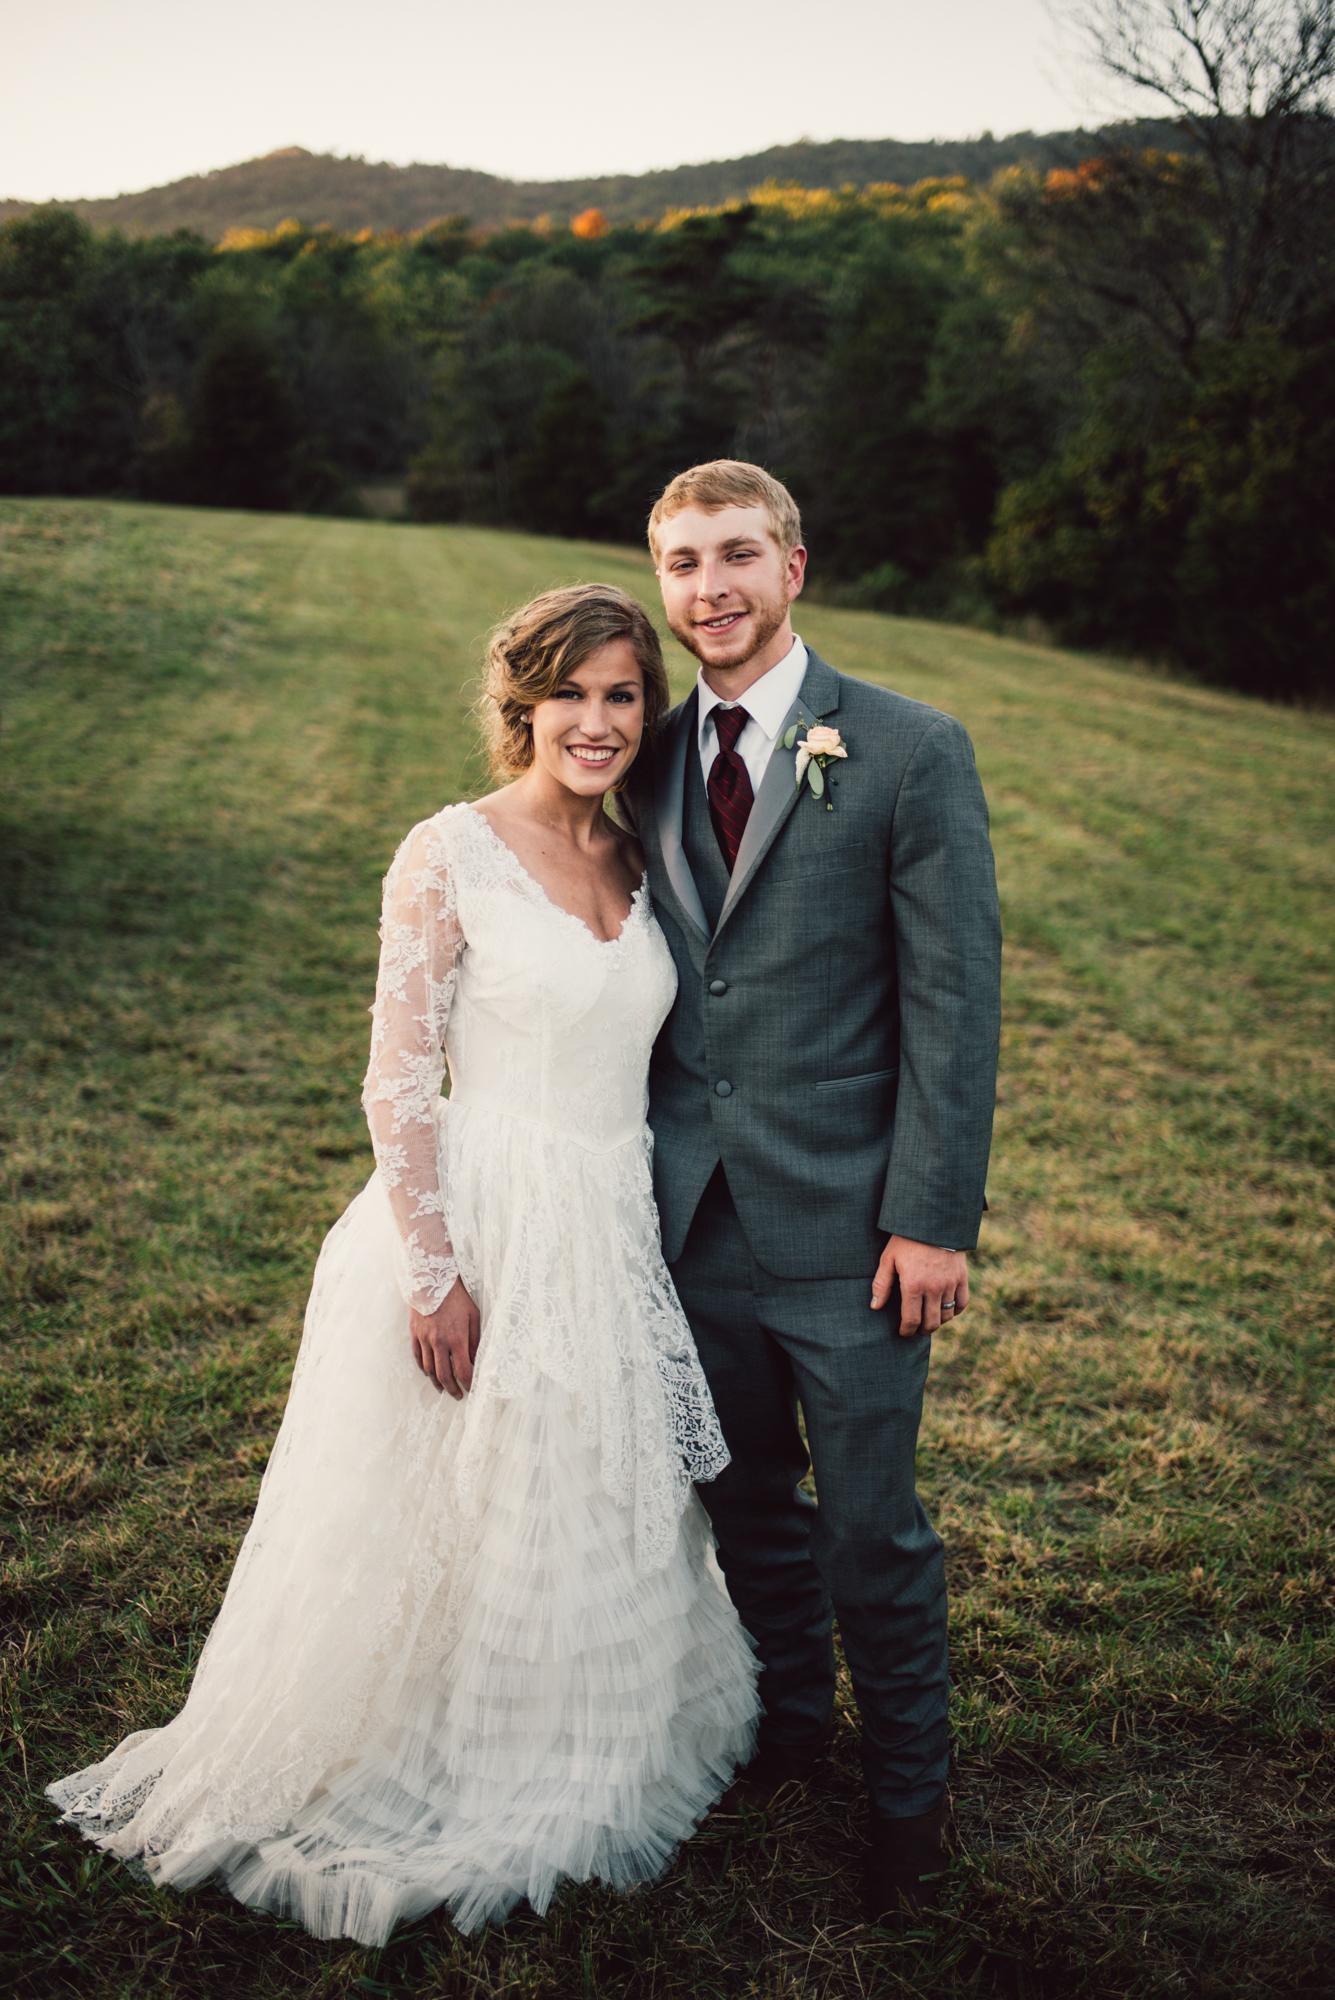 Ashley-and-Michael-Beaune-Woodstock-Virginia-Wedding-Shenandoah-Valley_46.JPG